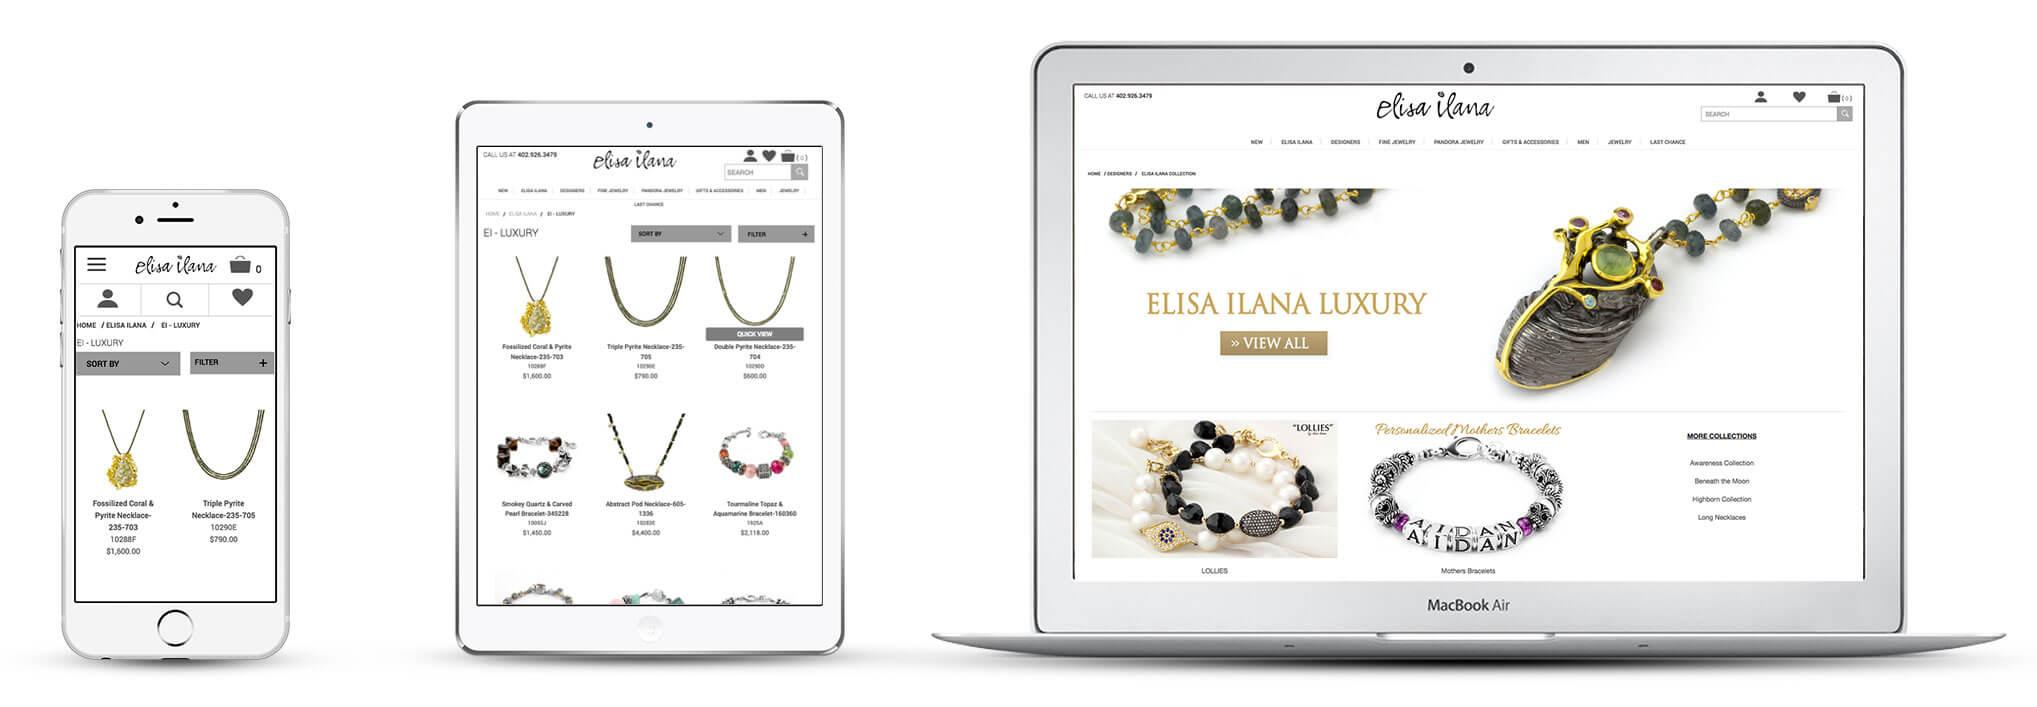 Echidna Elisailana Website Design Across Devices